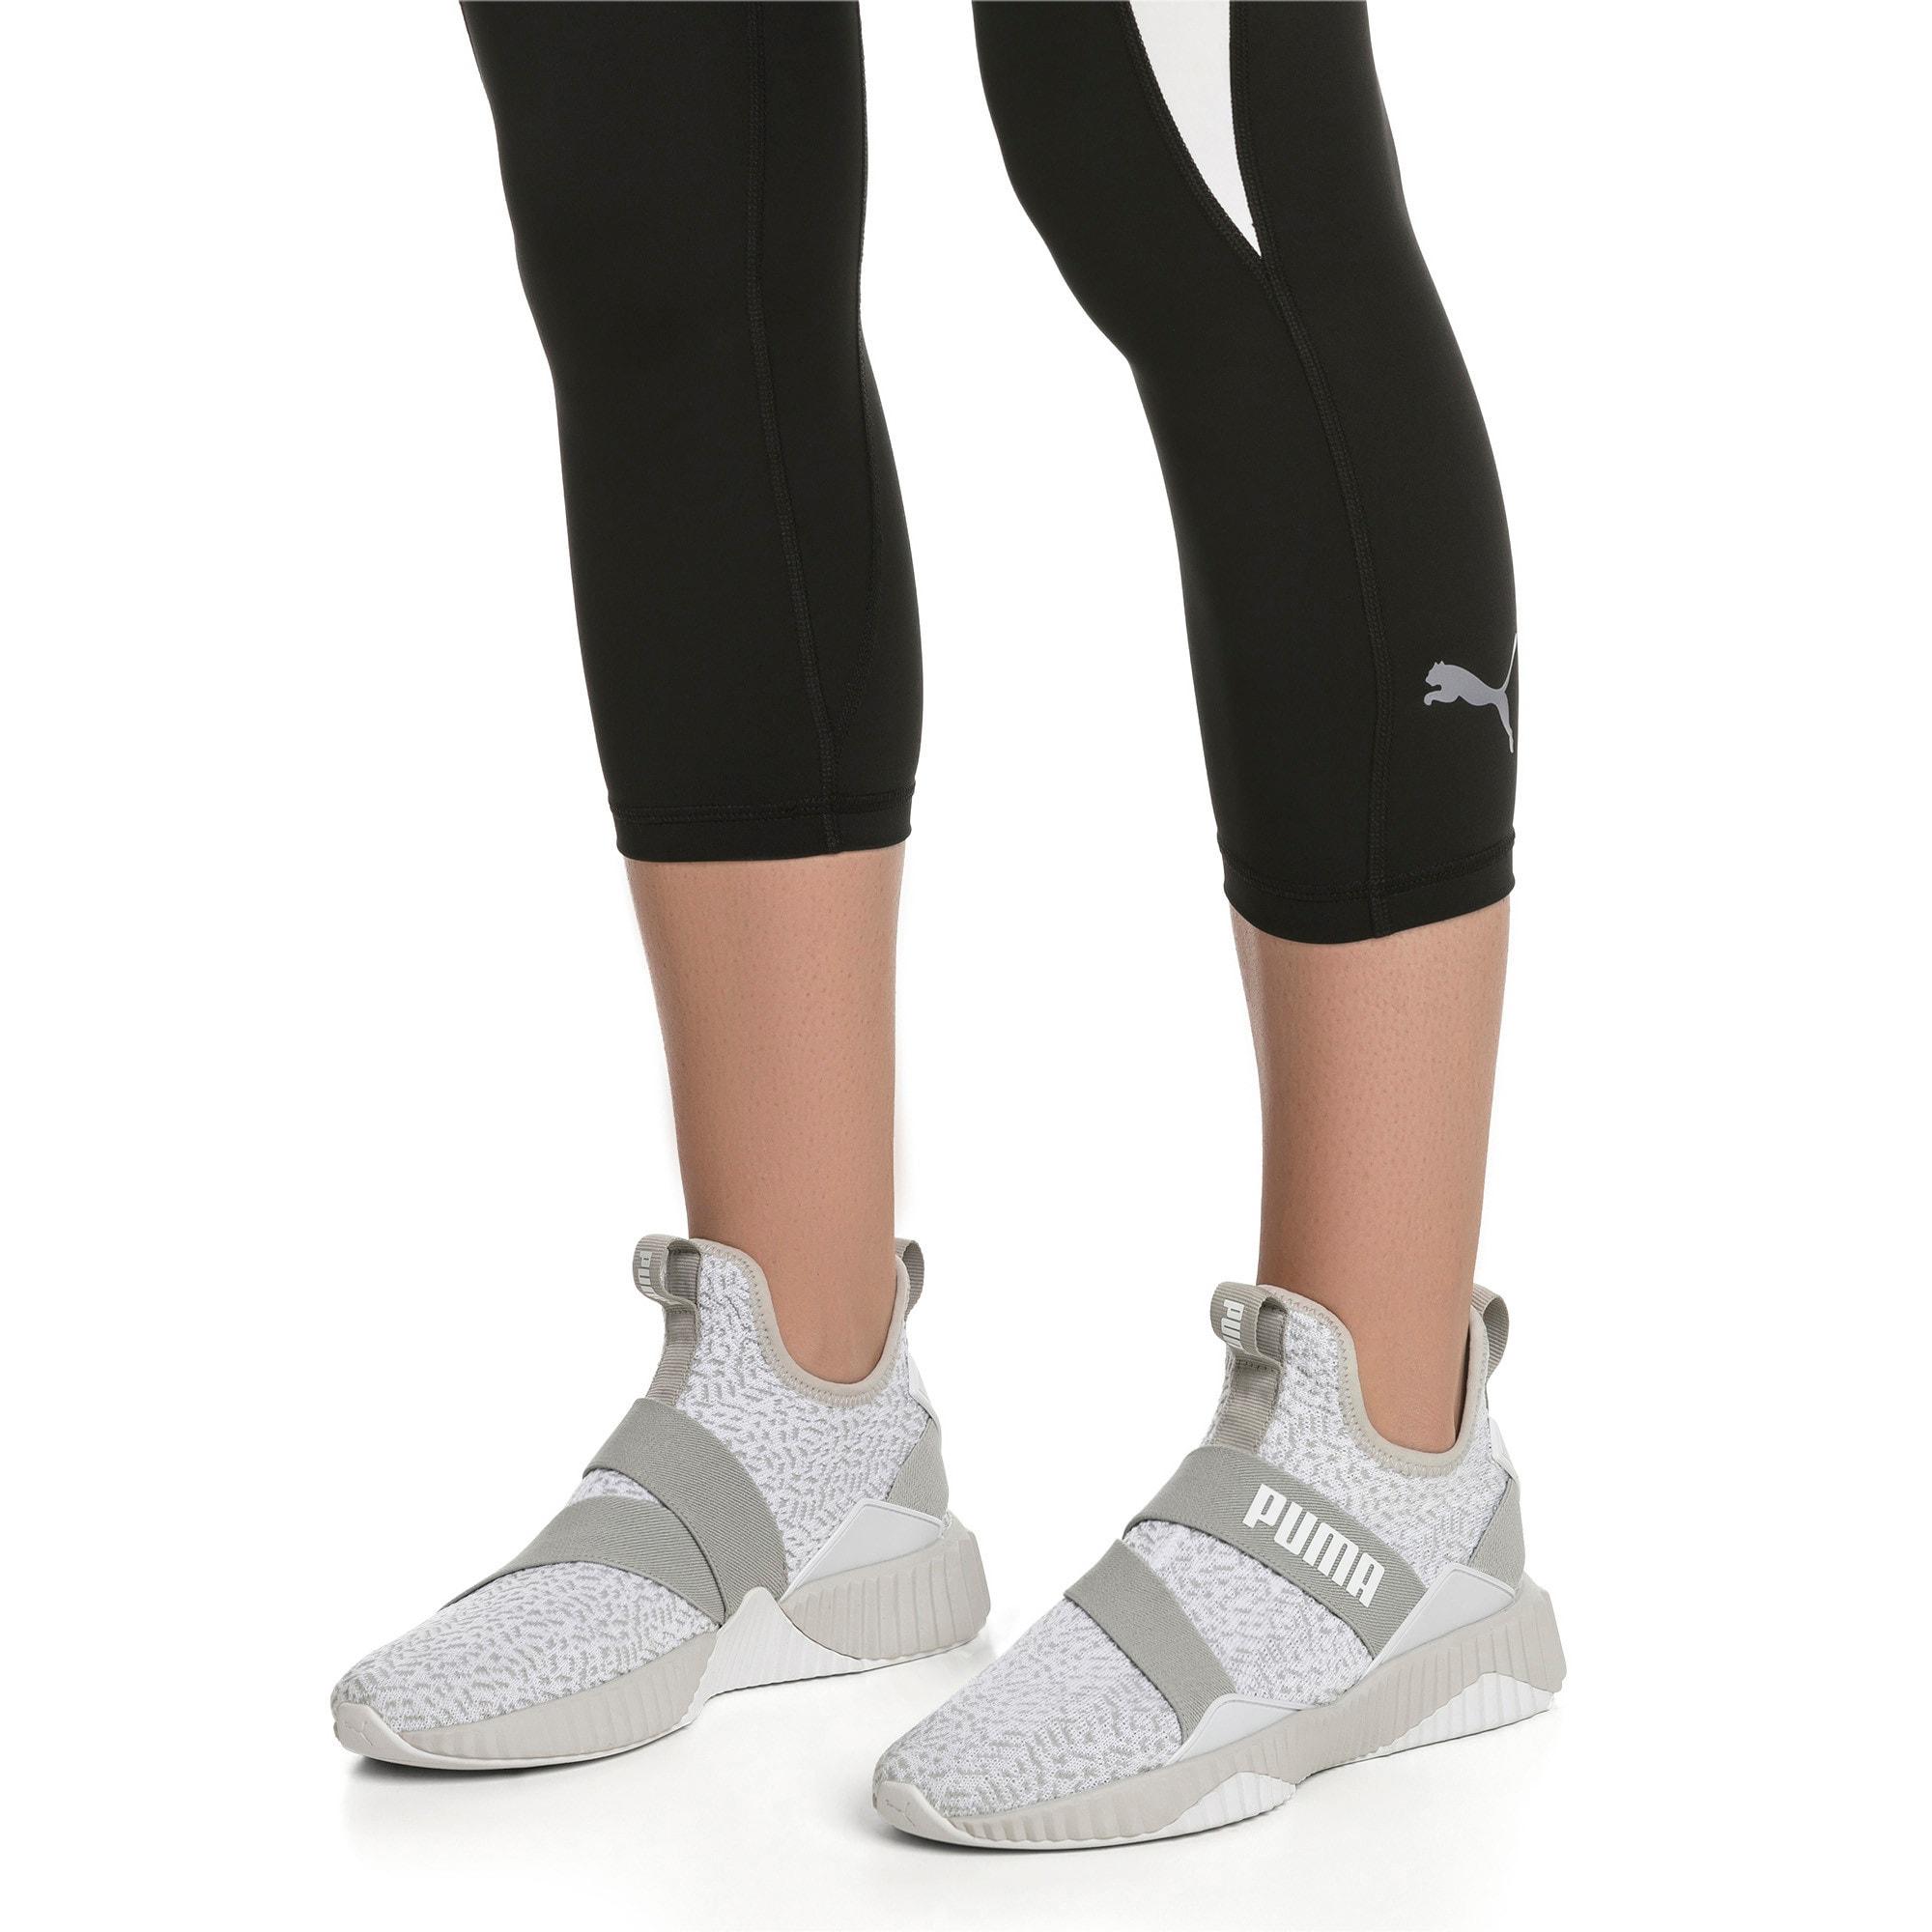 Thumbnail 7 of Defy Mid Animal Women's Training Shoes, Gray Violet-Puma White, medium